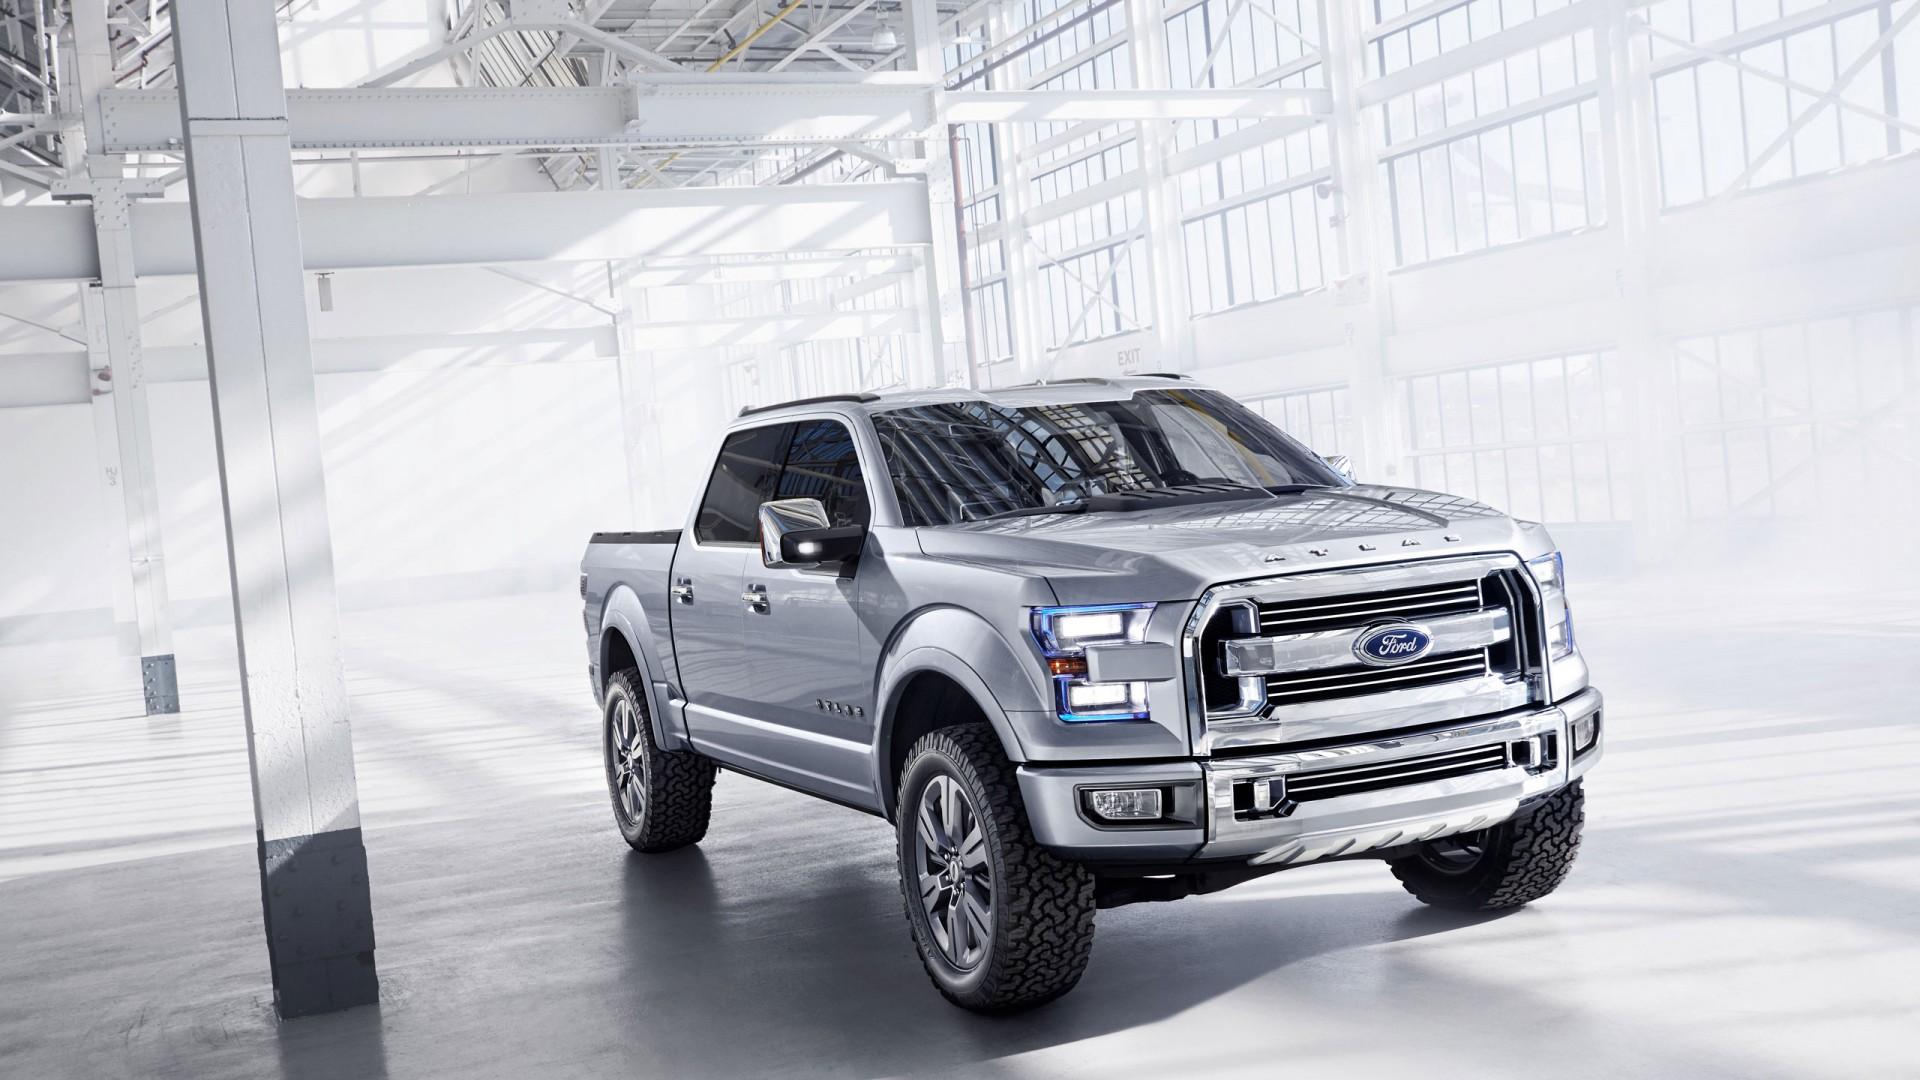 2013 Ford Atlas C Wallpaper | HD Car Wallpapers | ID #3209